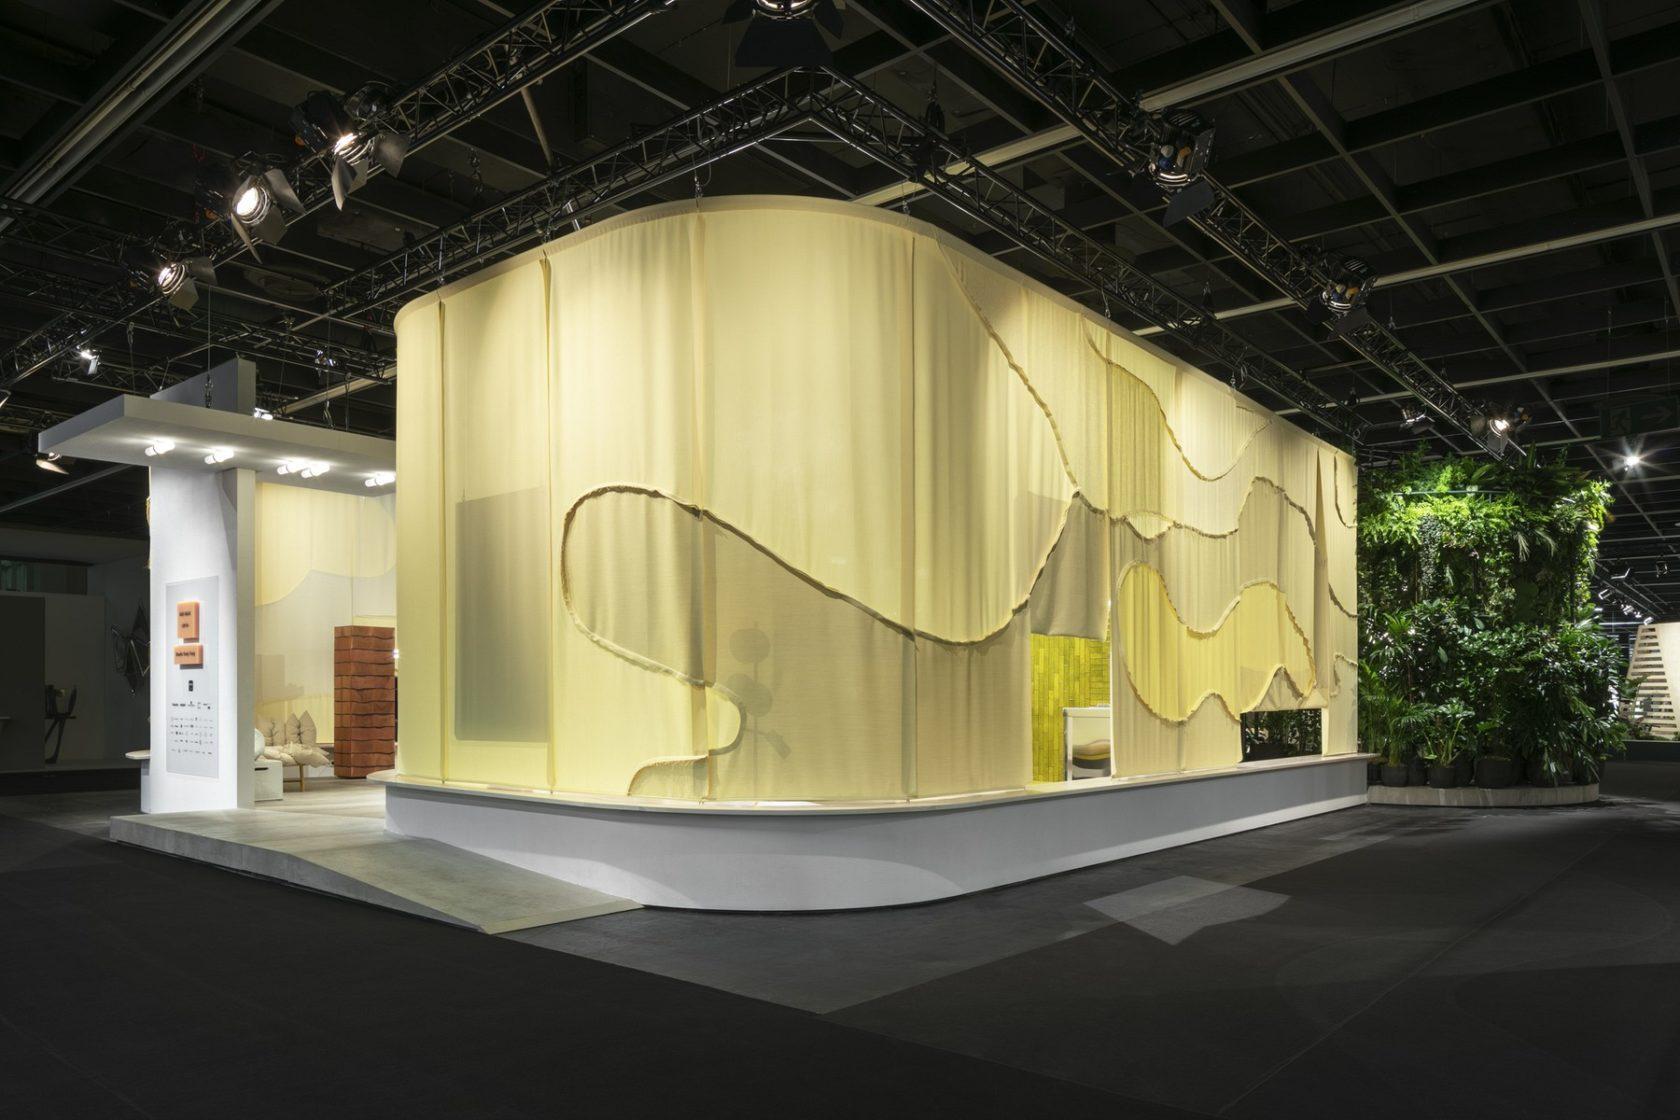 Imm Cologne 2019 Koelnmesse Messe Messebau Das Haus 2019 Moebelmesse Interior Design 6